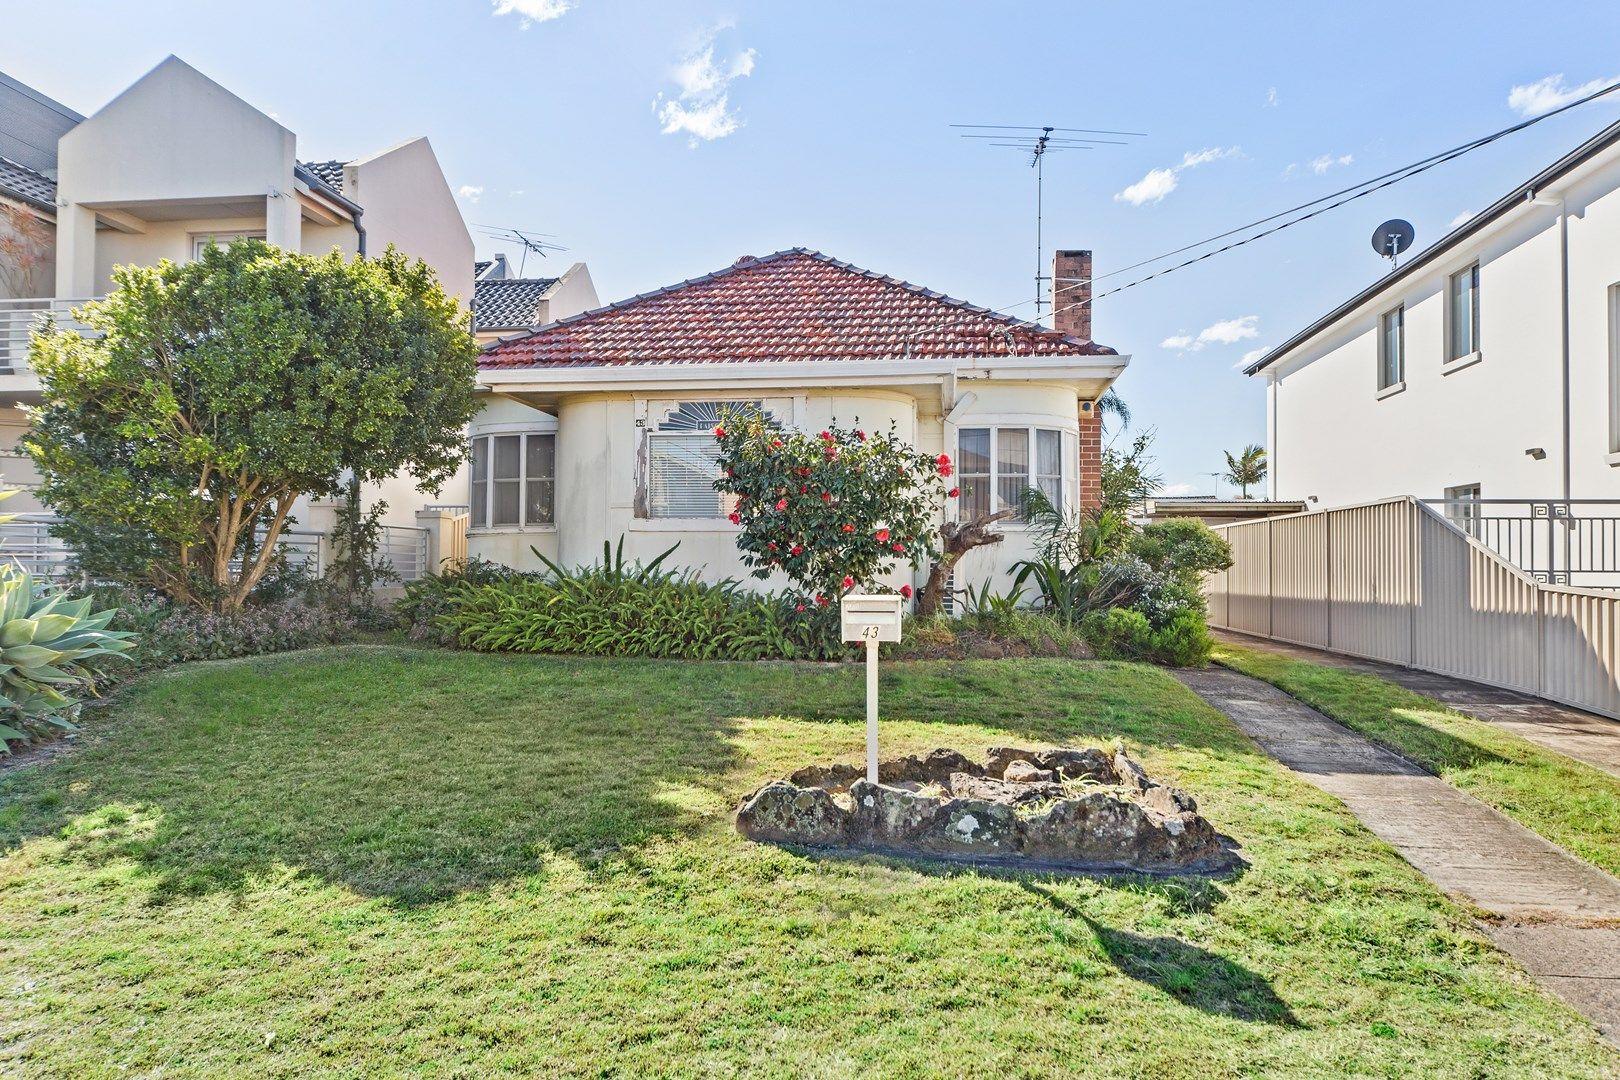 43 Culver Street, Monterey NSW 2217, Image 0